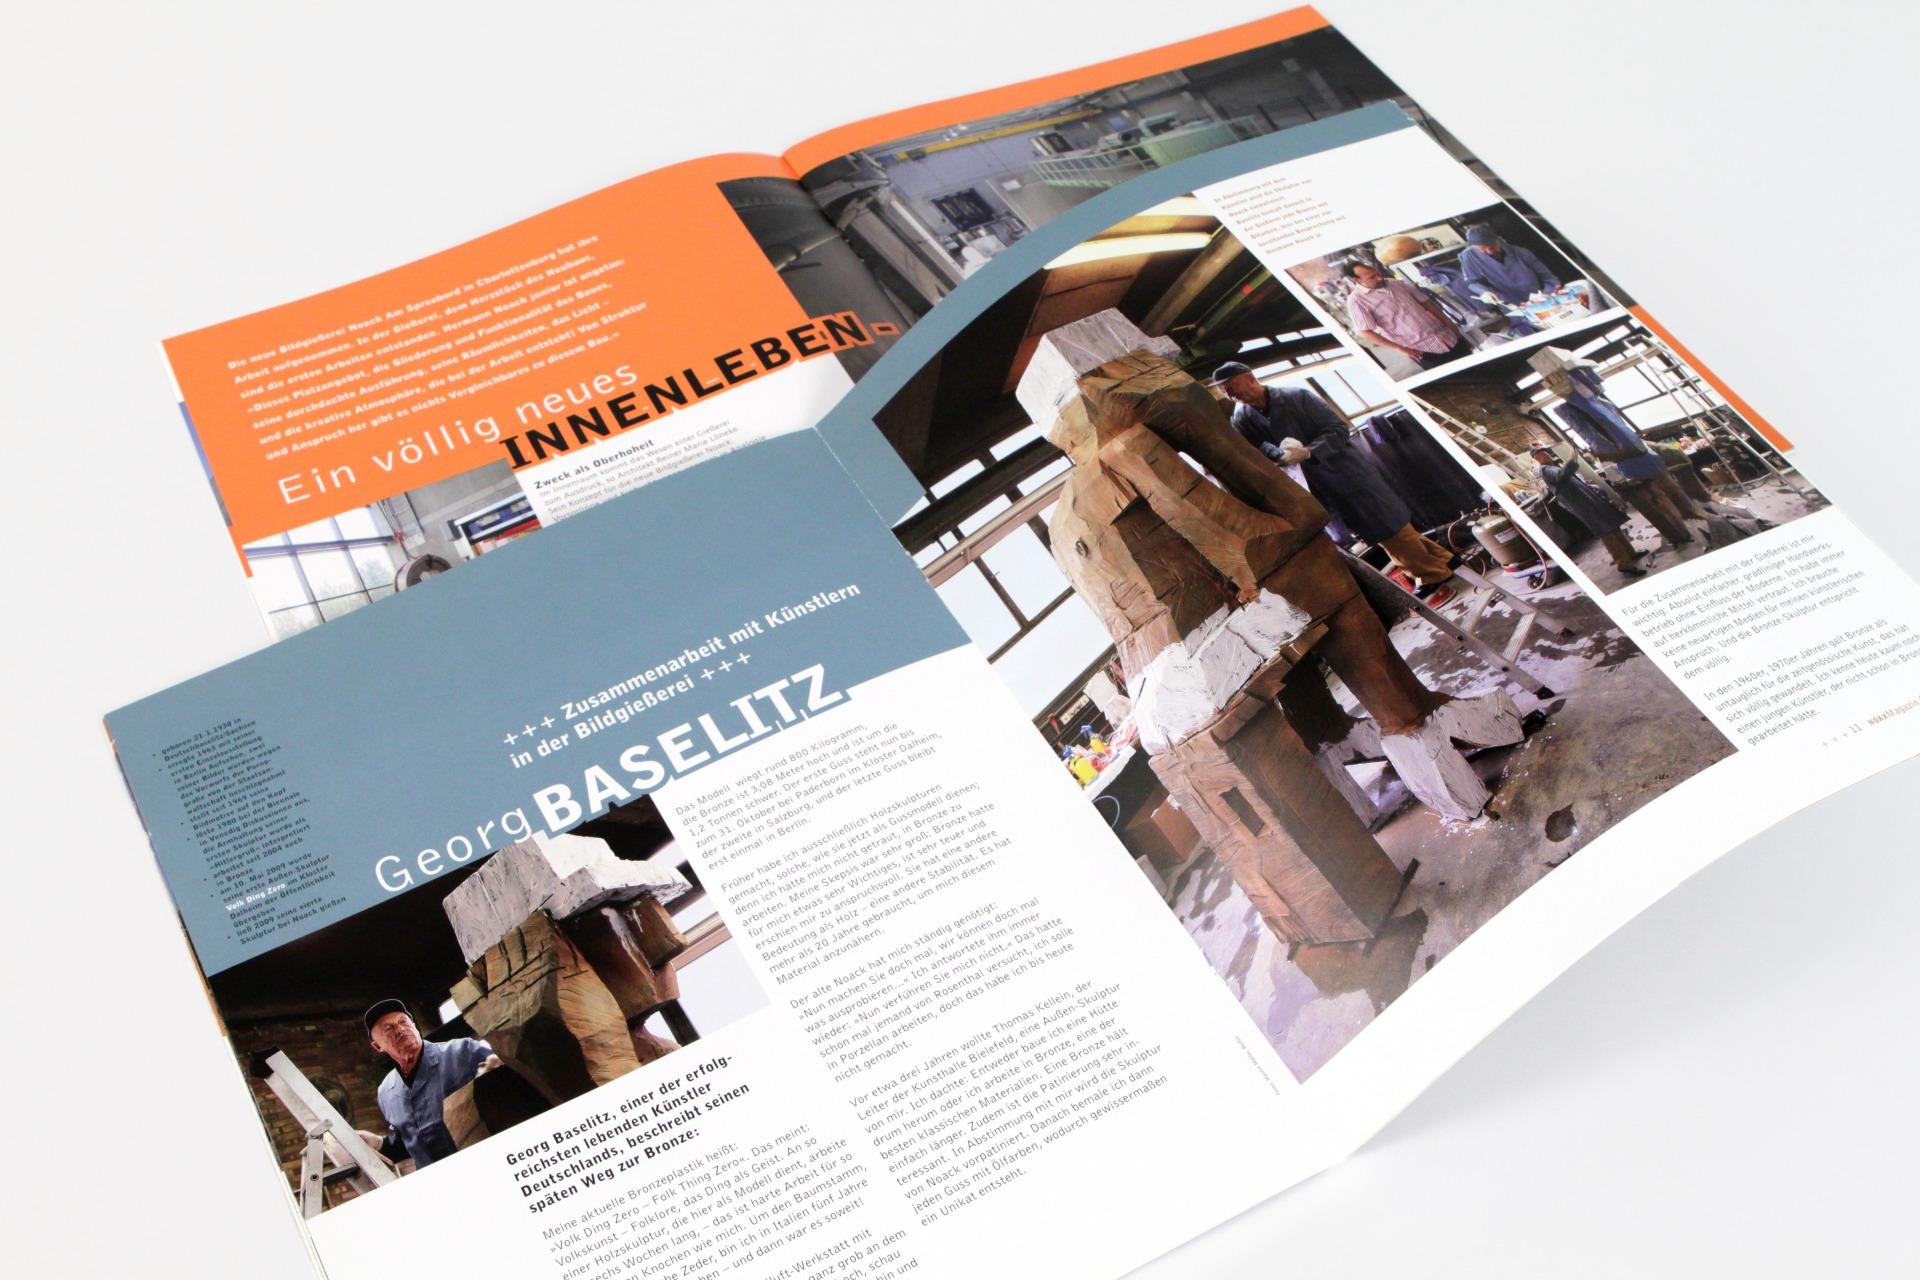 Noax Kundenmagazin Doppelseiten - Typoly